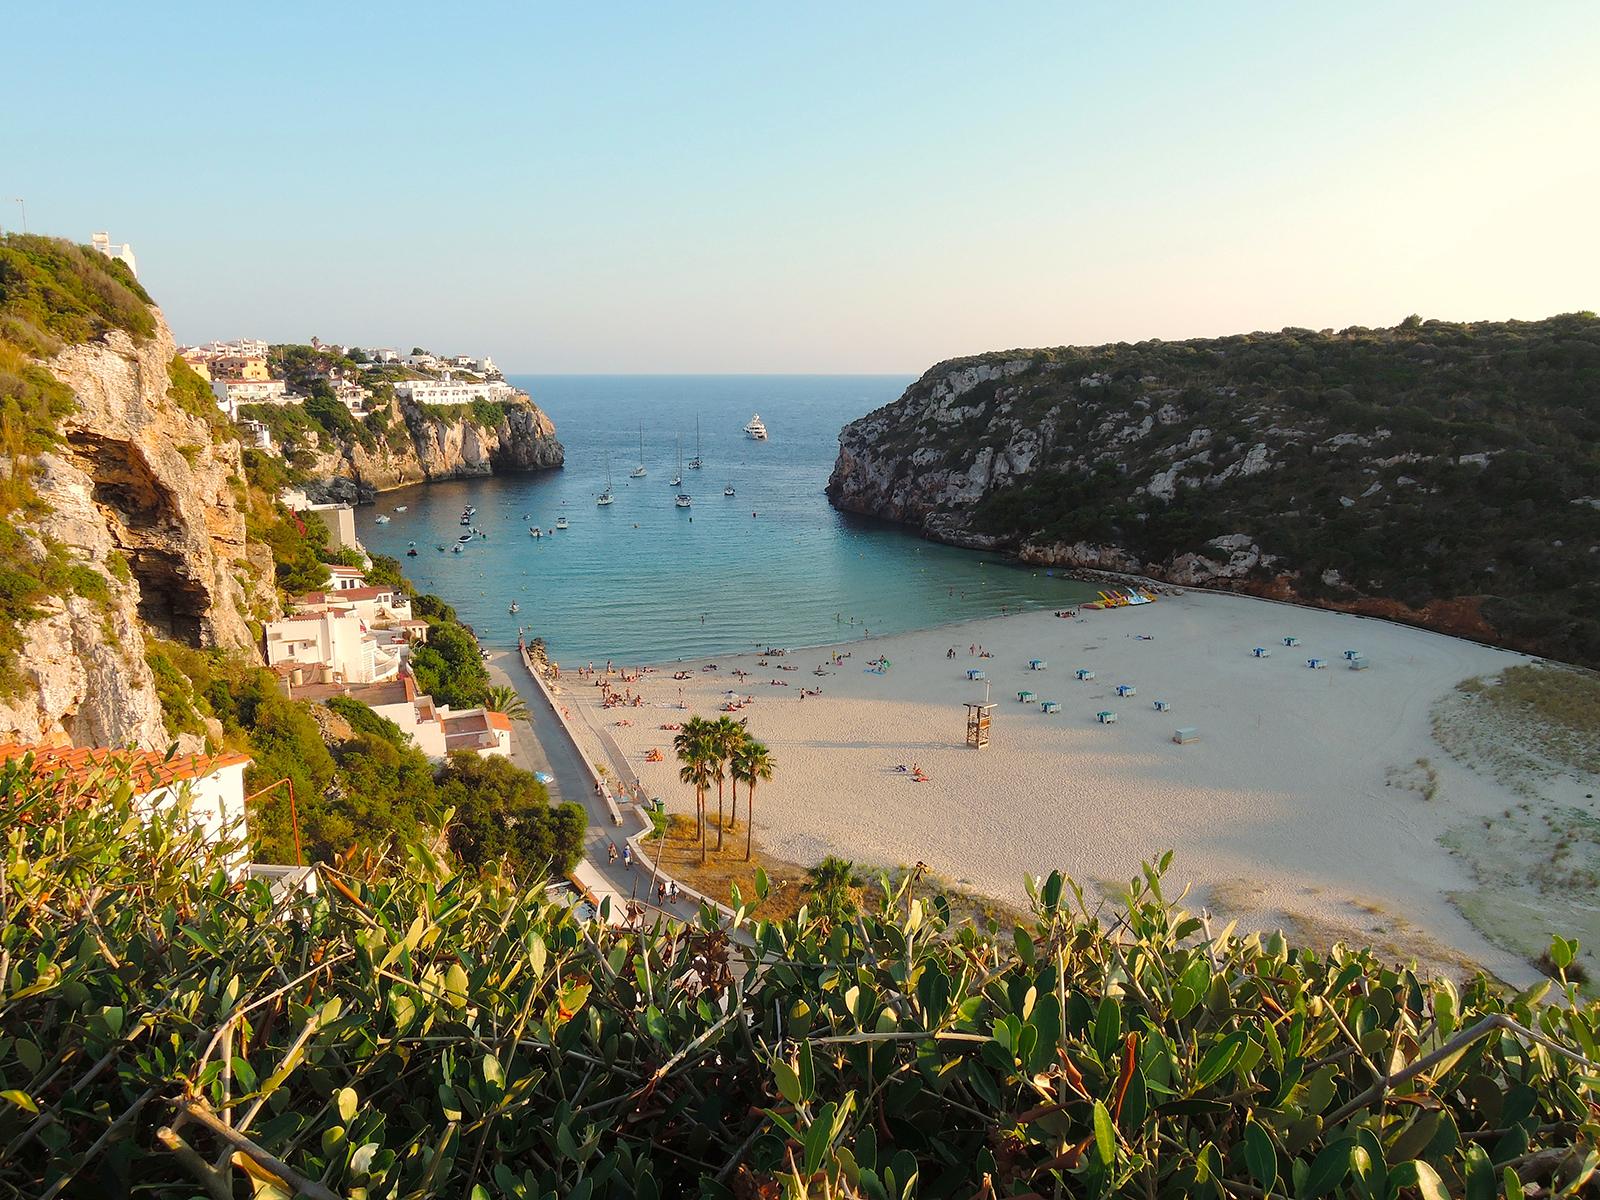 Cala en Porter Menorca Balearic Islands